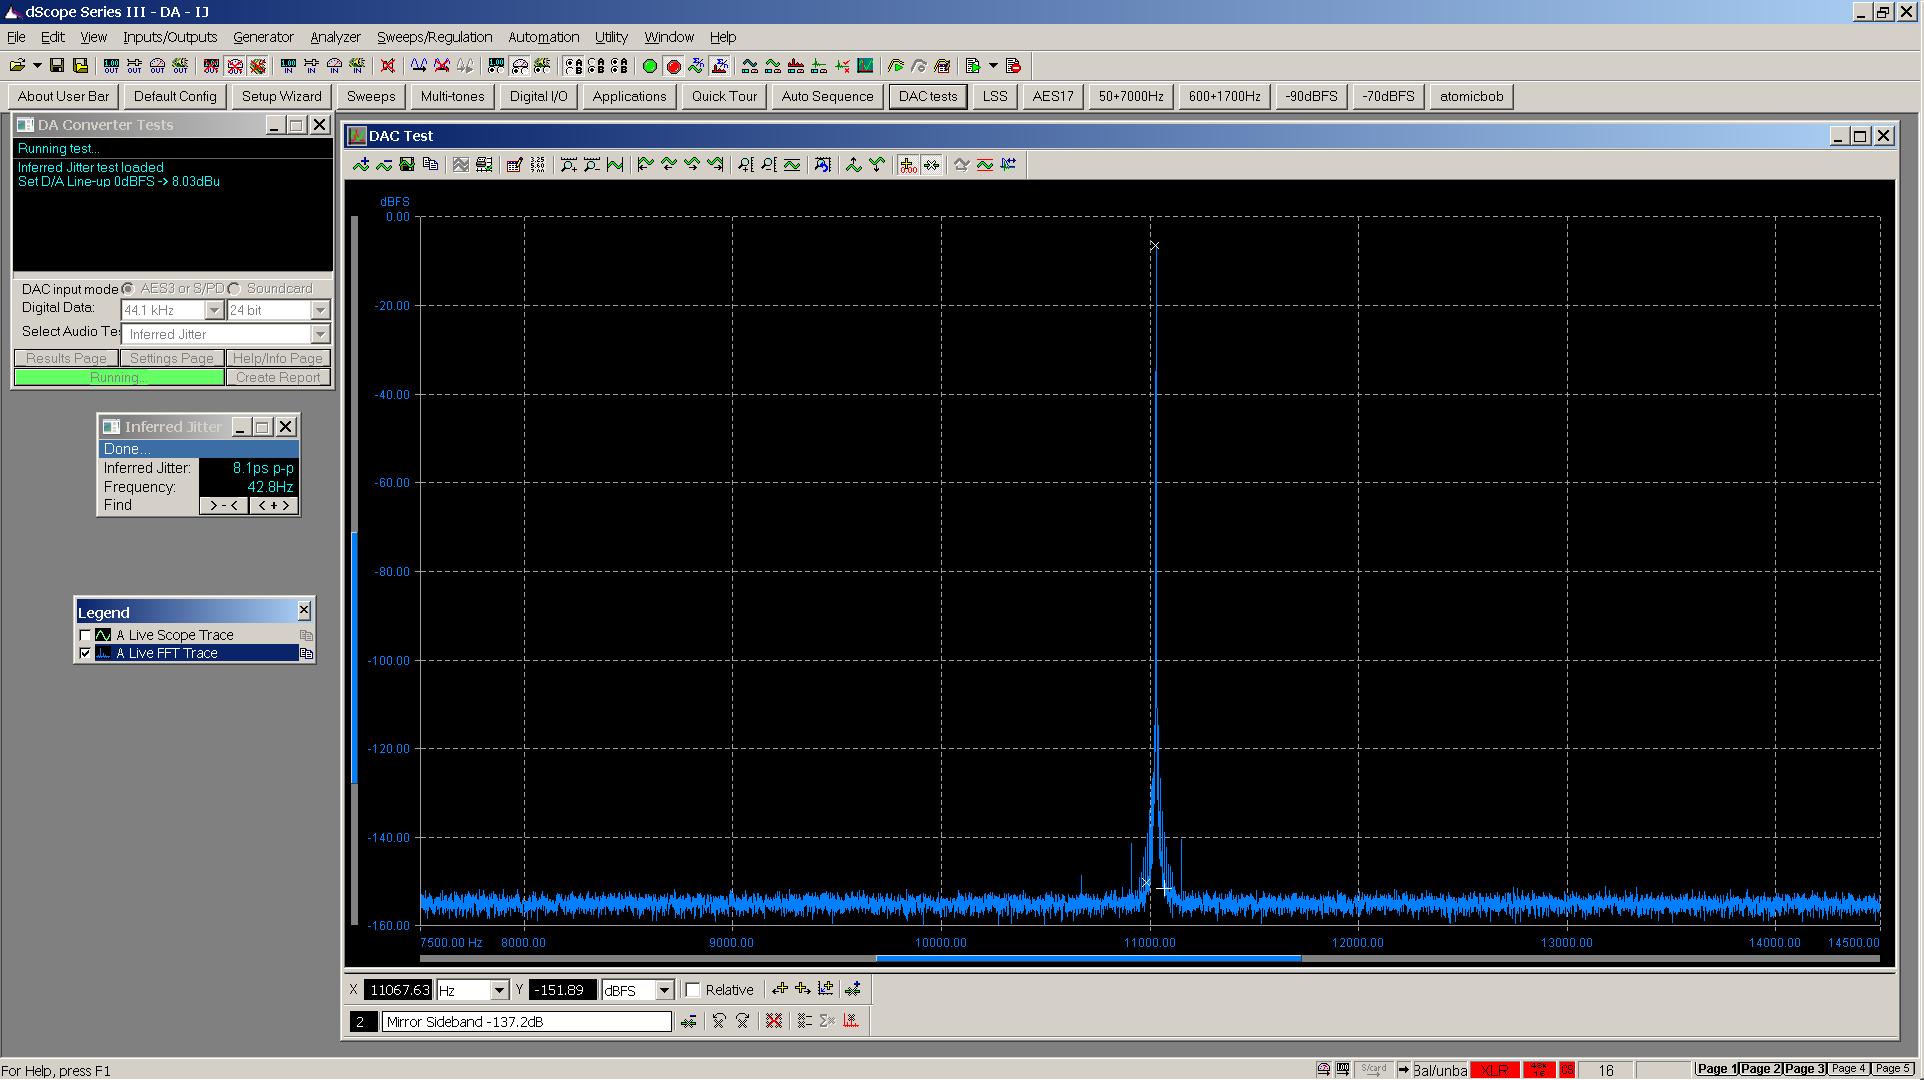 03 SE inferred jitter - spdif.PNG